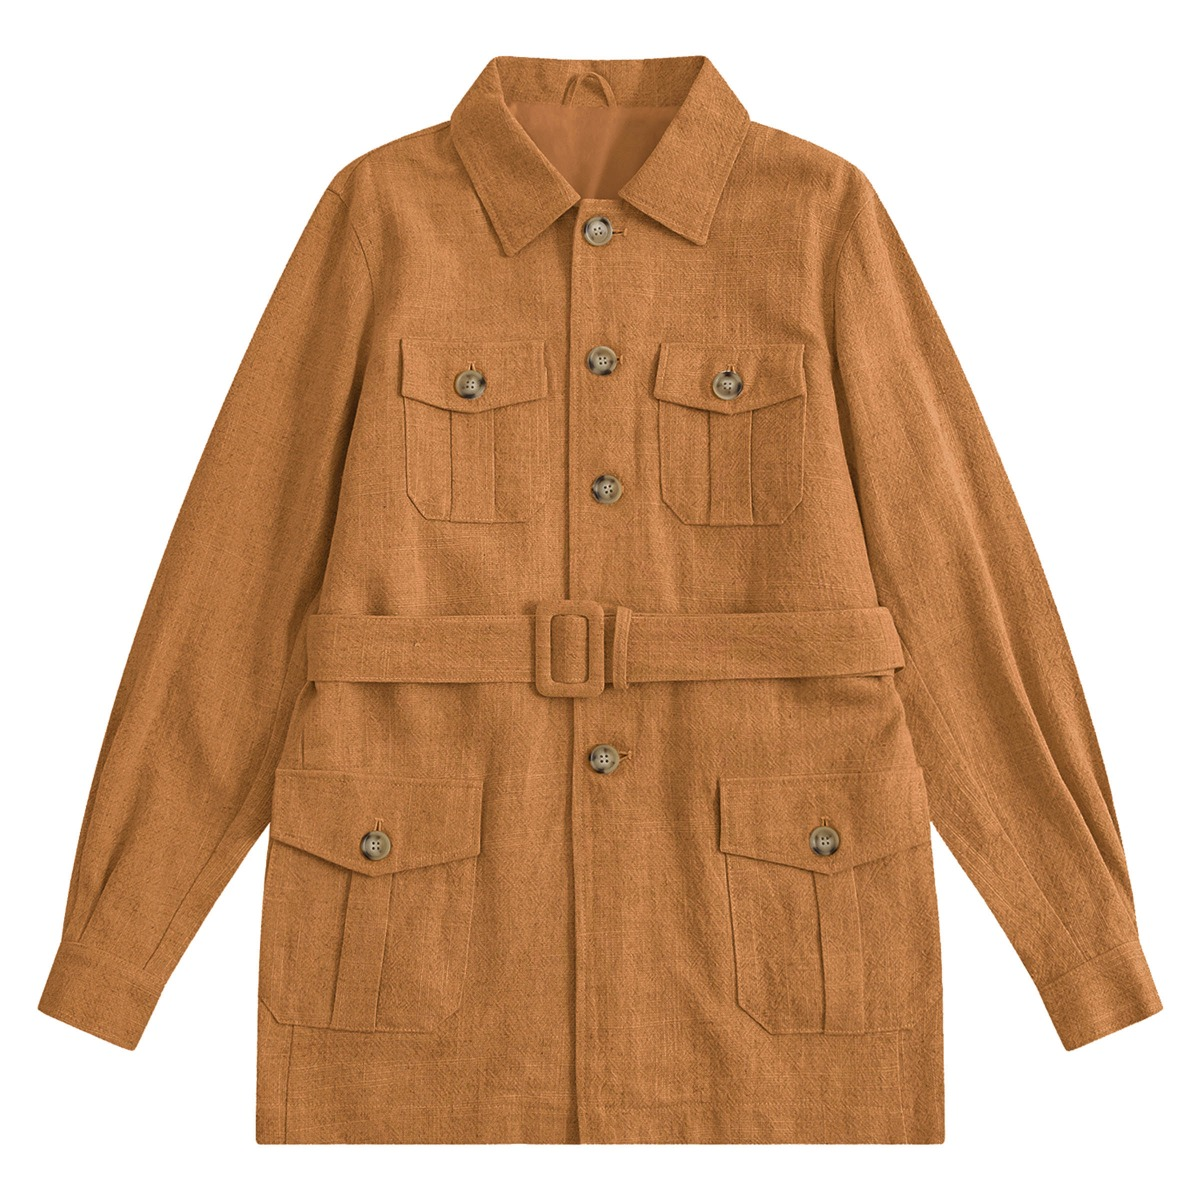 Mustard Indian Textured Linen Hemingway Safari Jacket